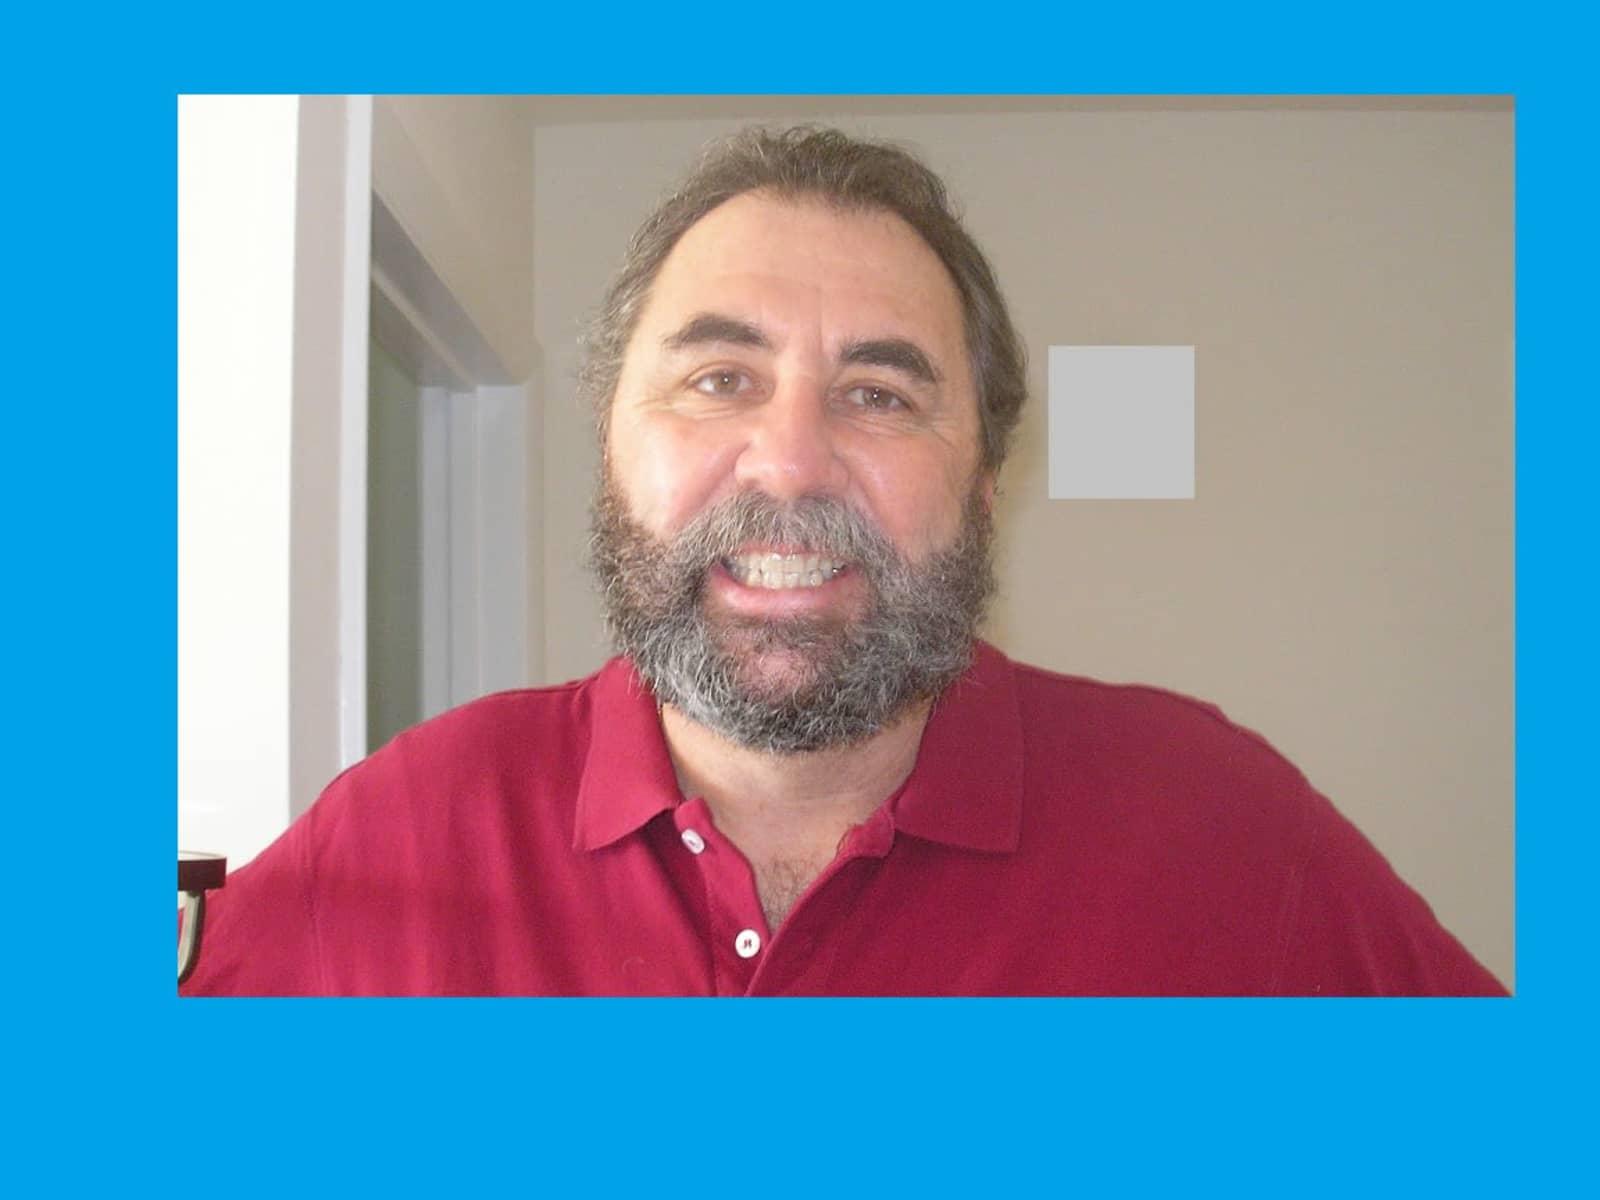 Jim from Richmond, Virginia, United States